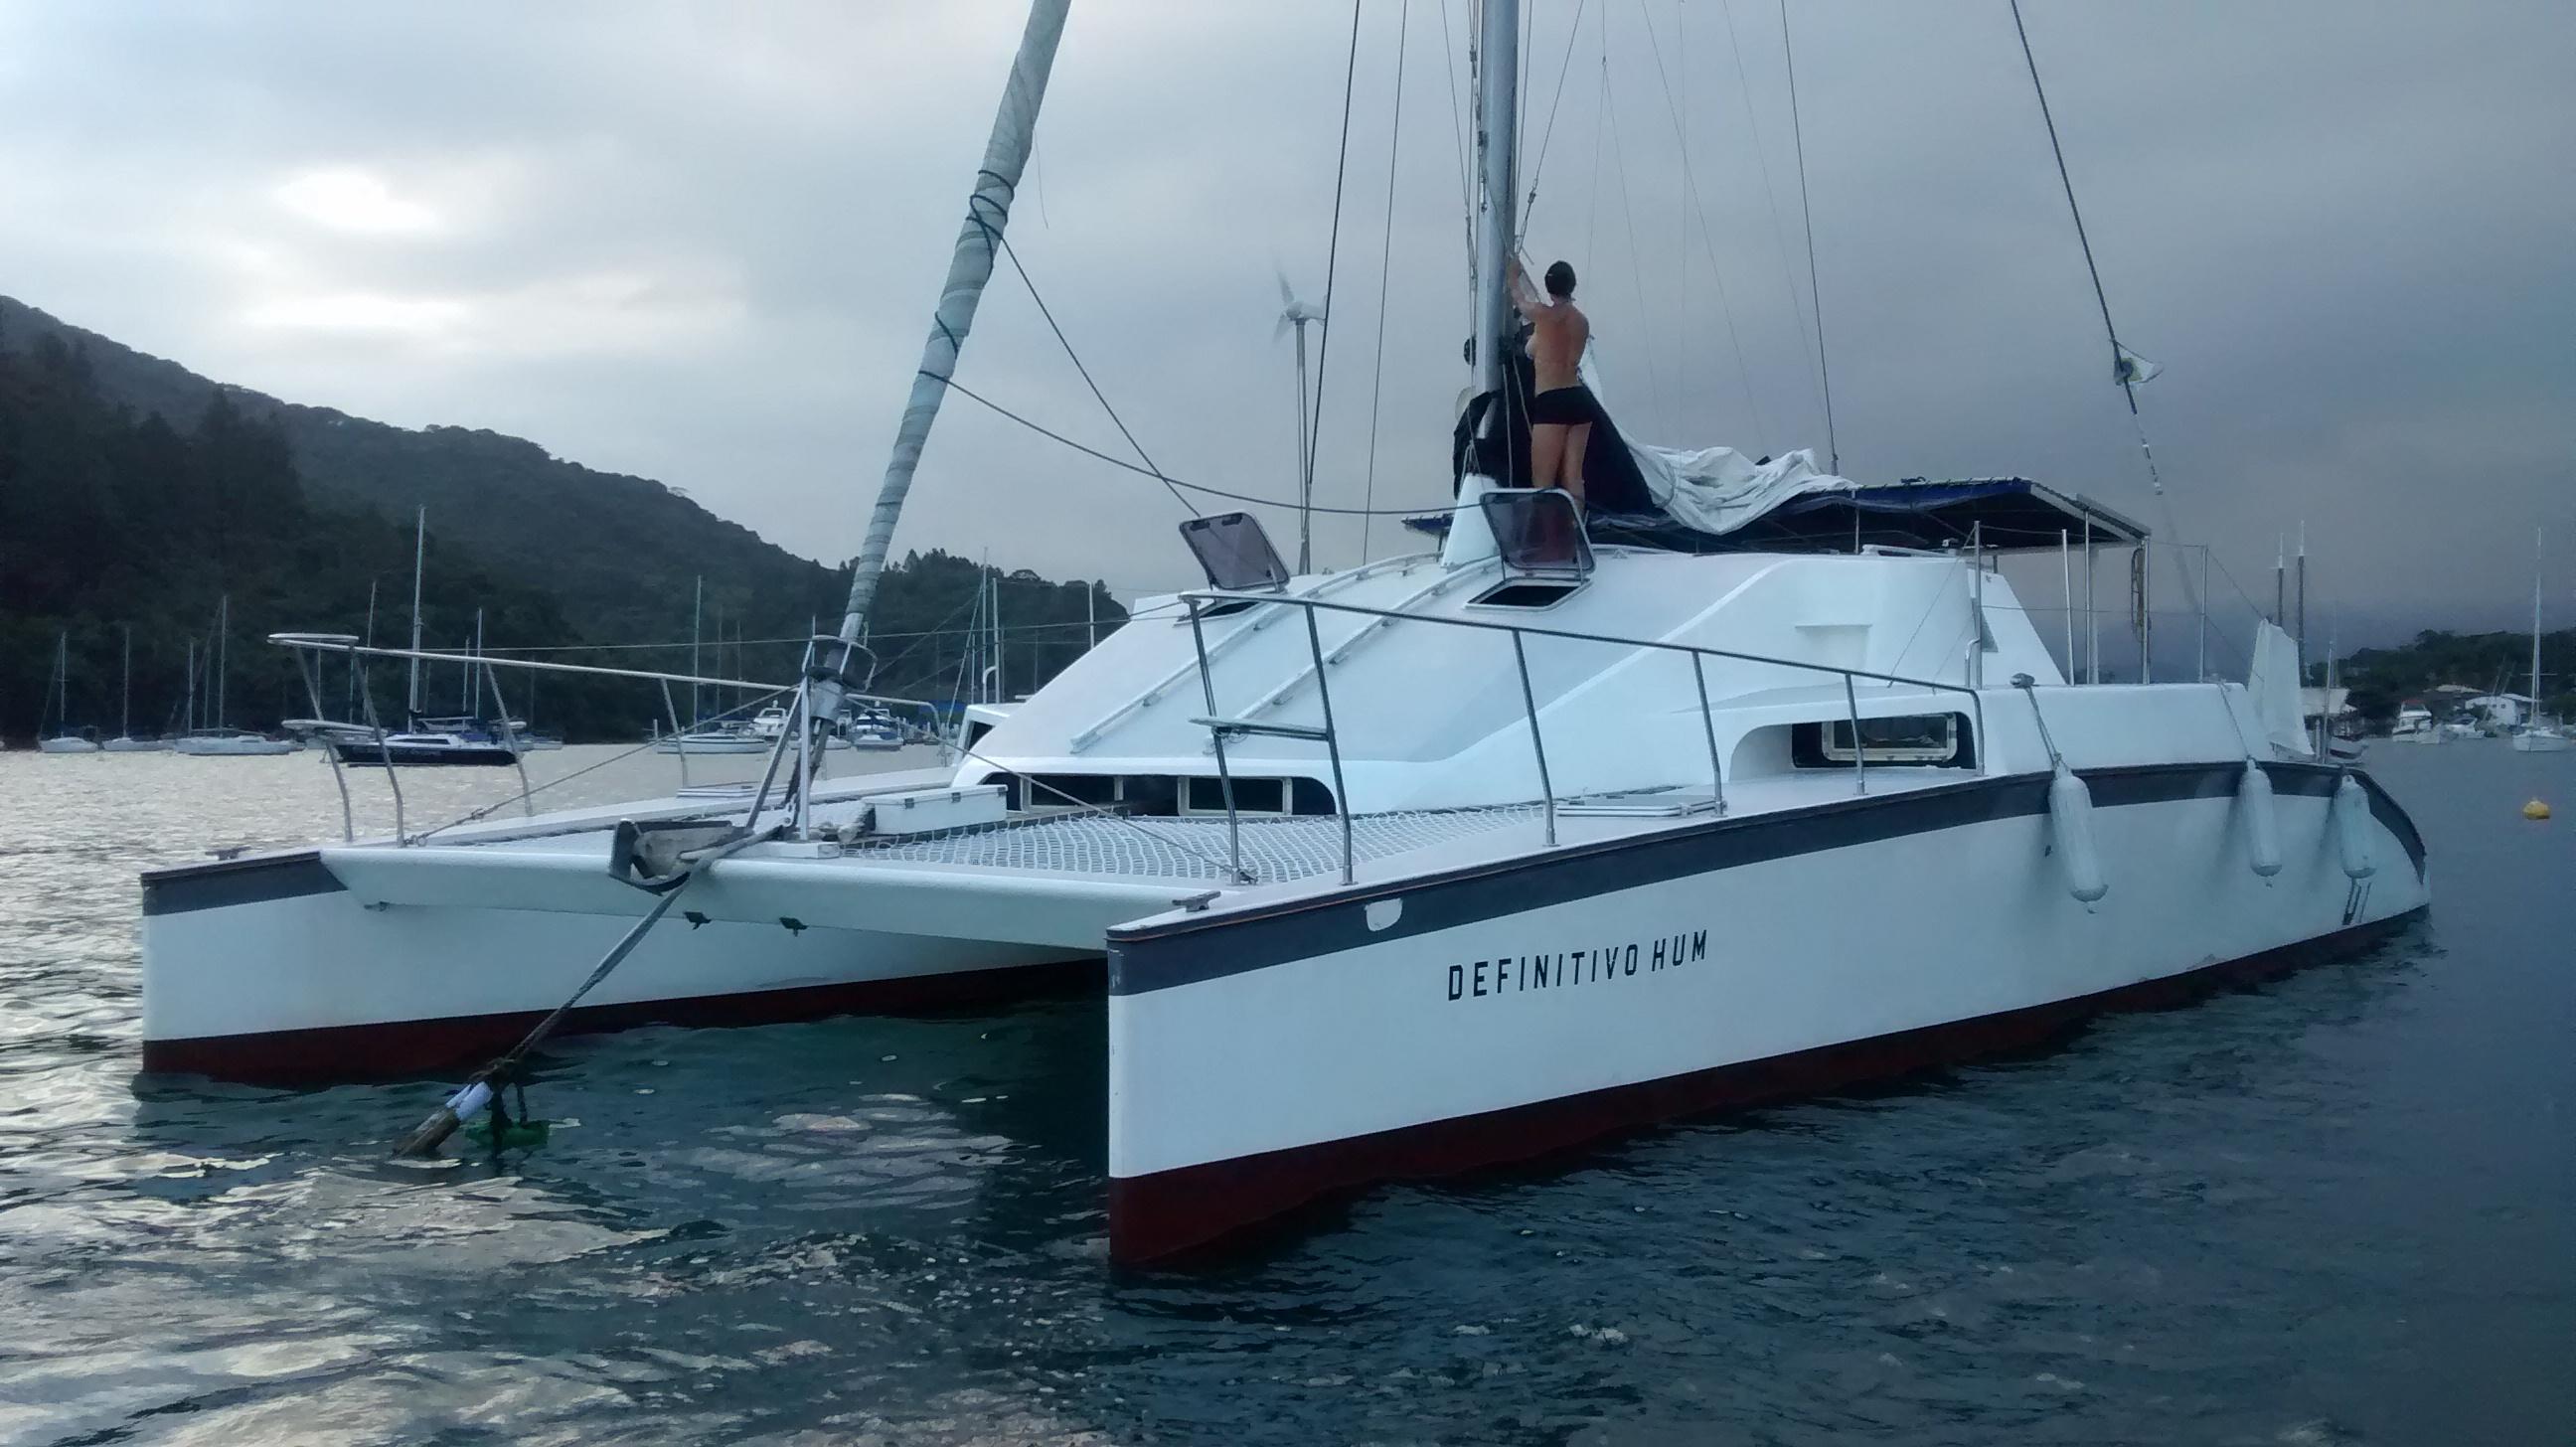 Brazil, Paraty. Catamaran sailboat